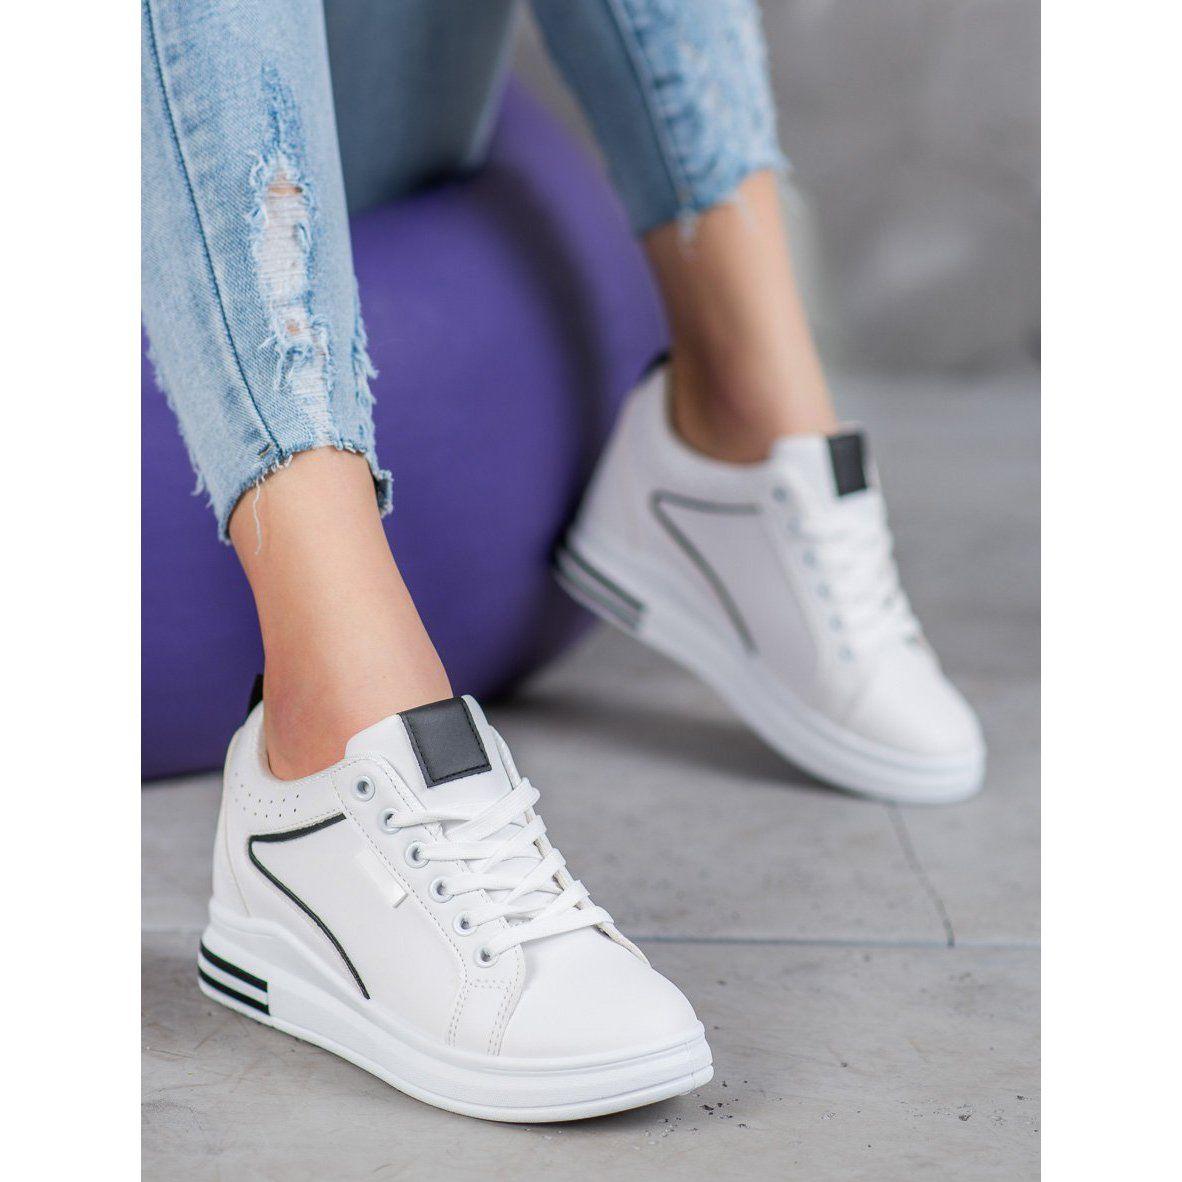 Shelovet Biale Obuwie Z Ukryta Koturna Wedge Sneaker Shoes Fashion